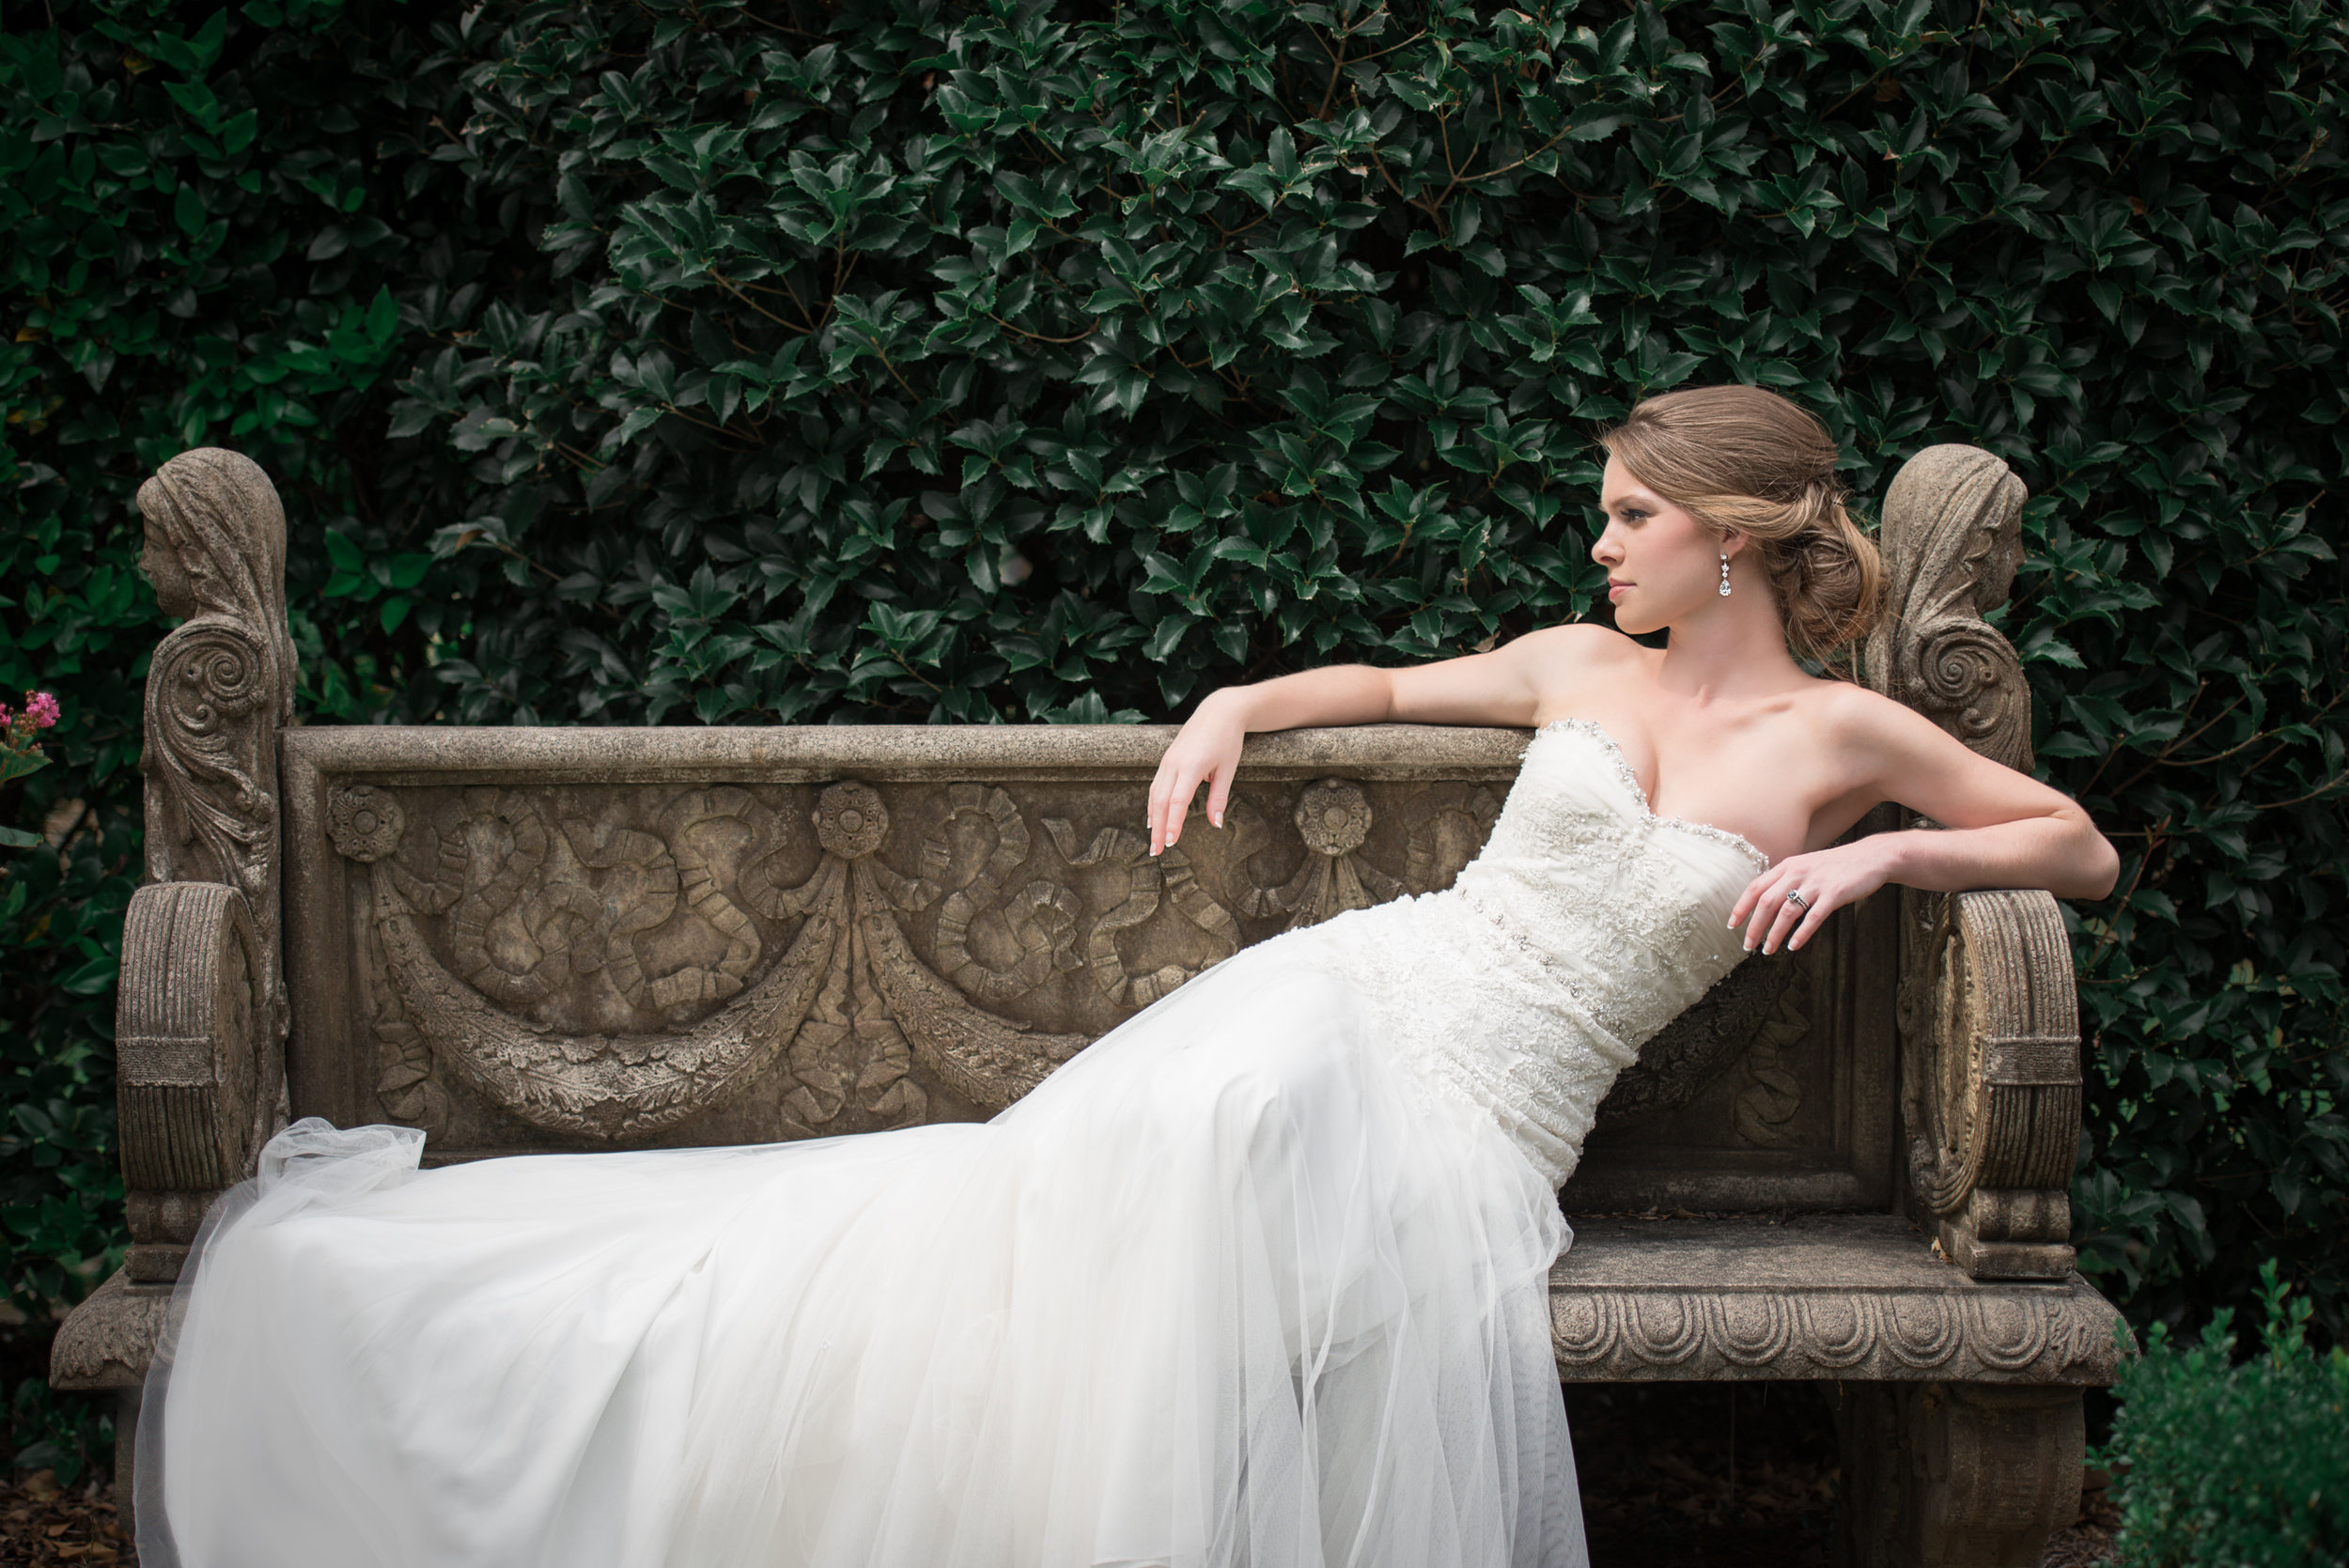 Fox Hollow Wedding Photography, Fayetteville, Fort Bragg, NC | By Yuliya Panchenko